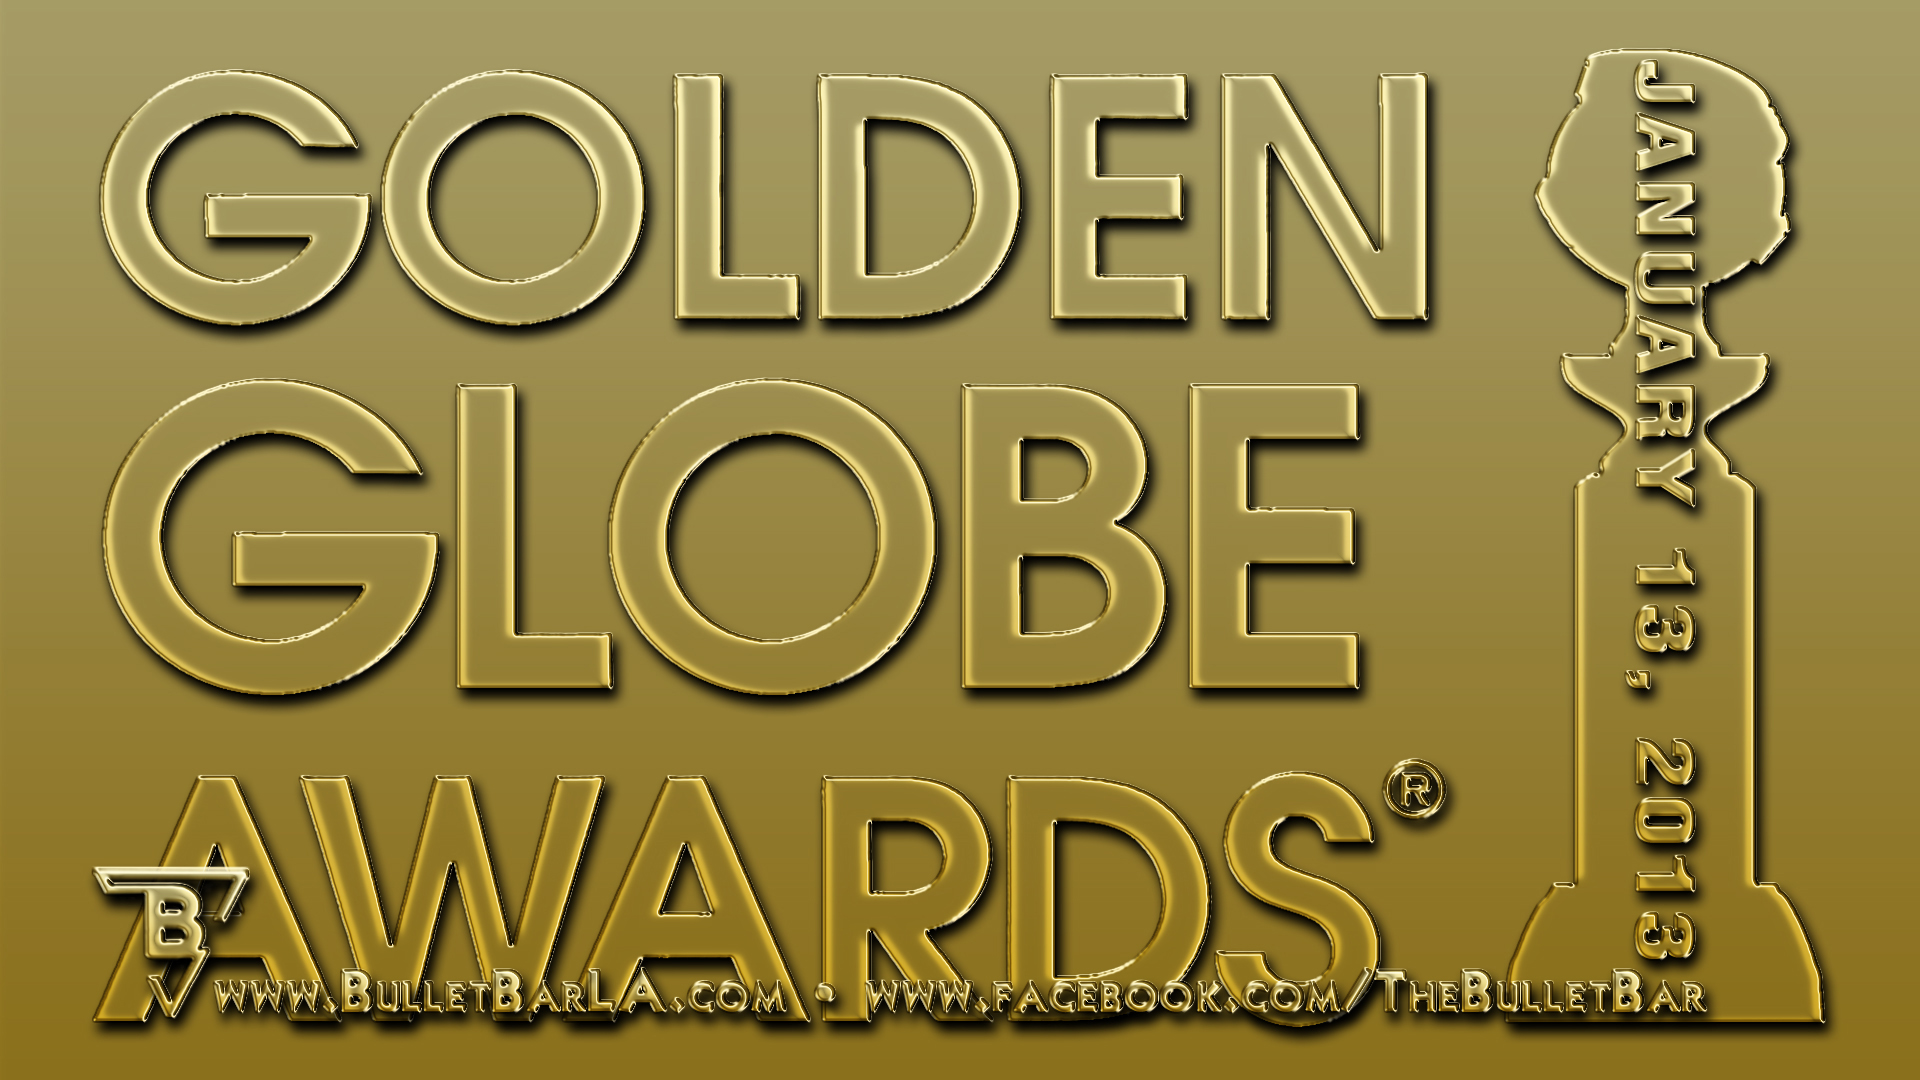 ����� ������� ������� ������ ����� ���� Golden Globe 2014